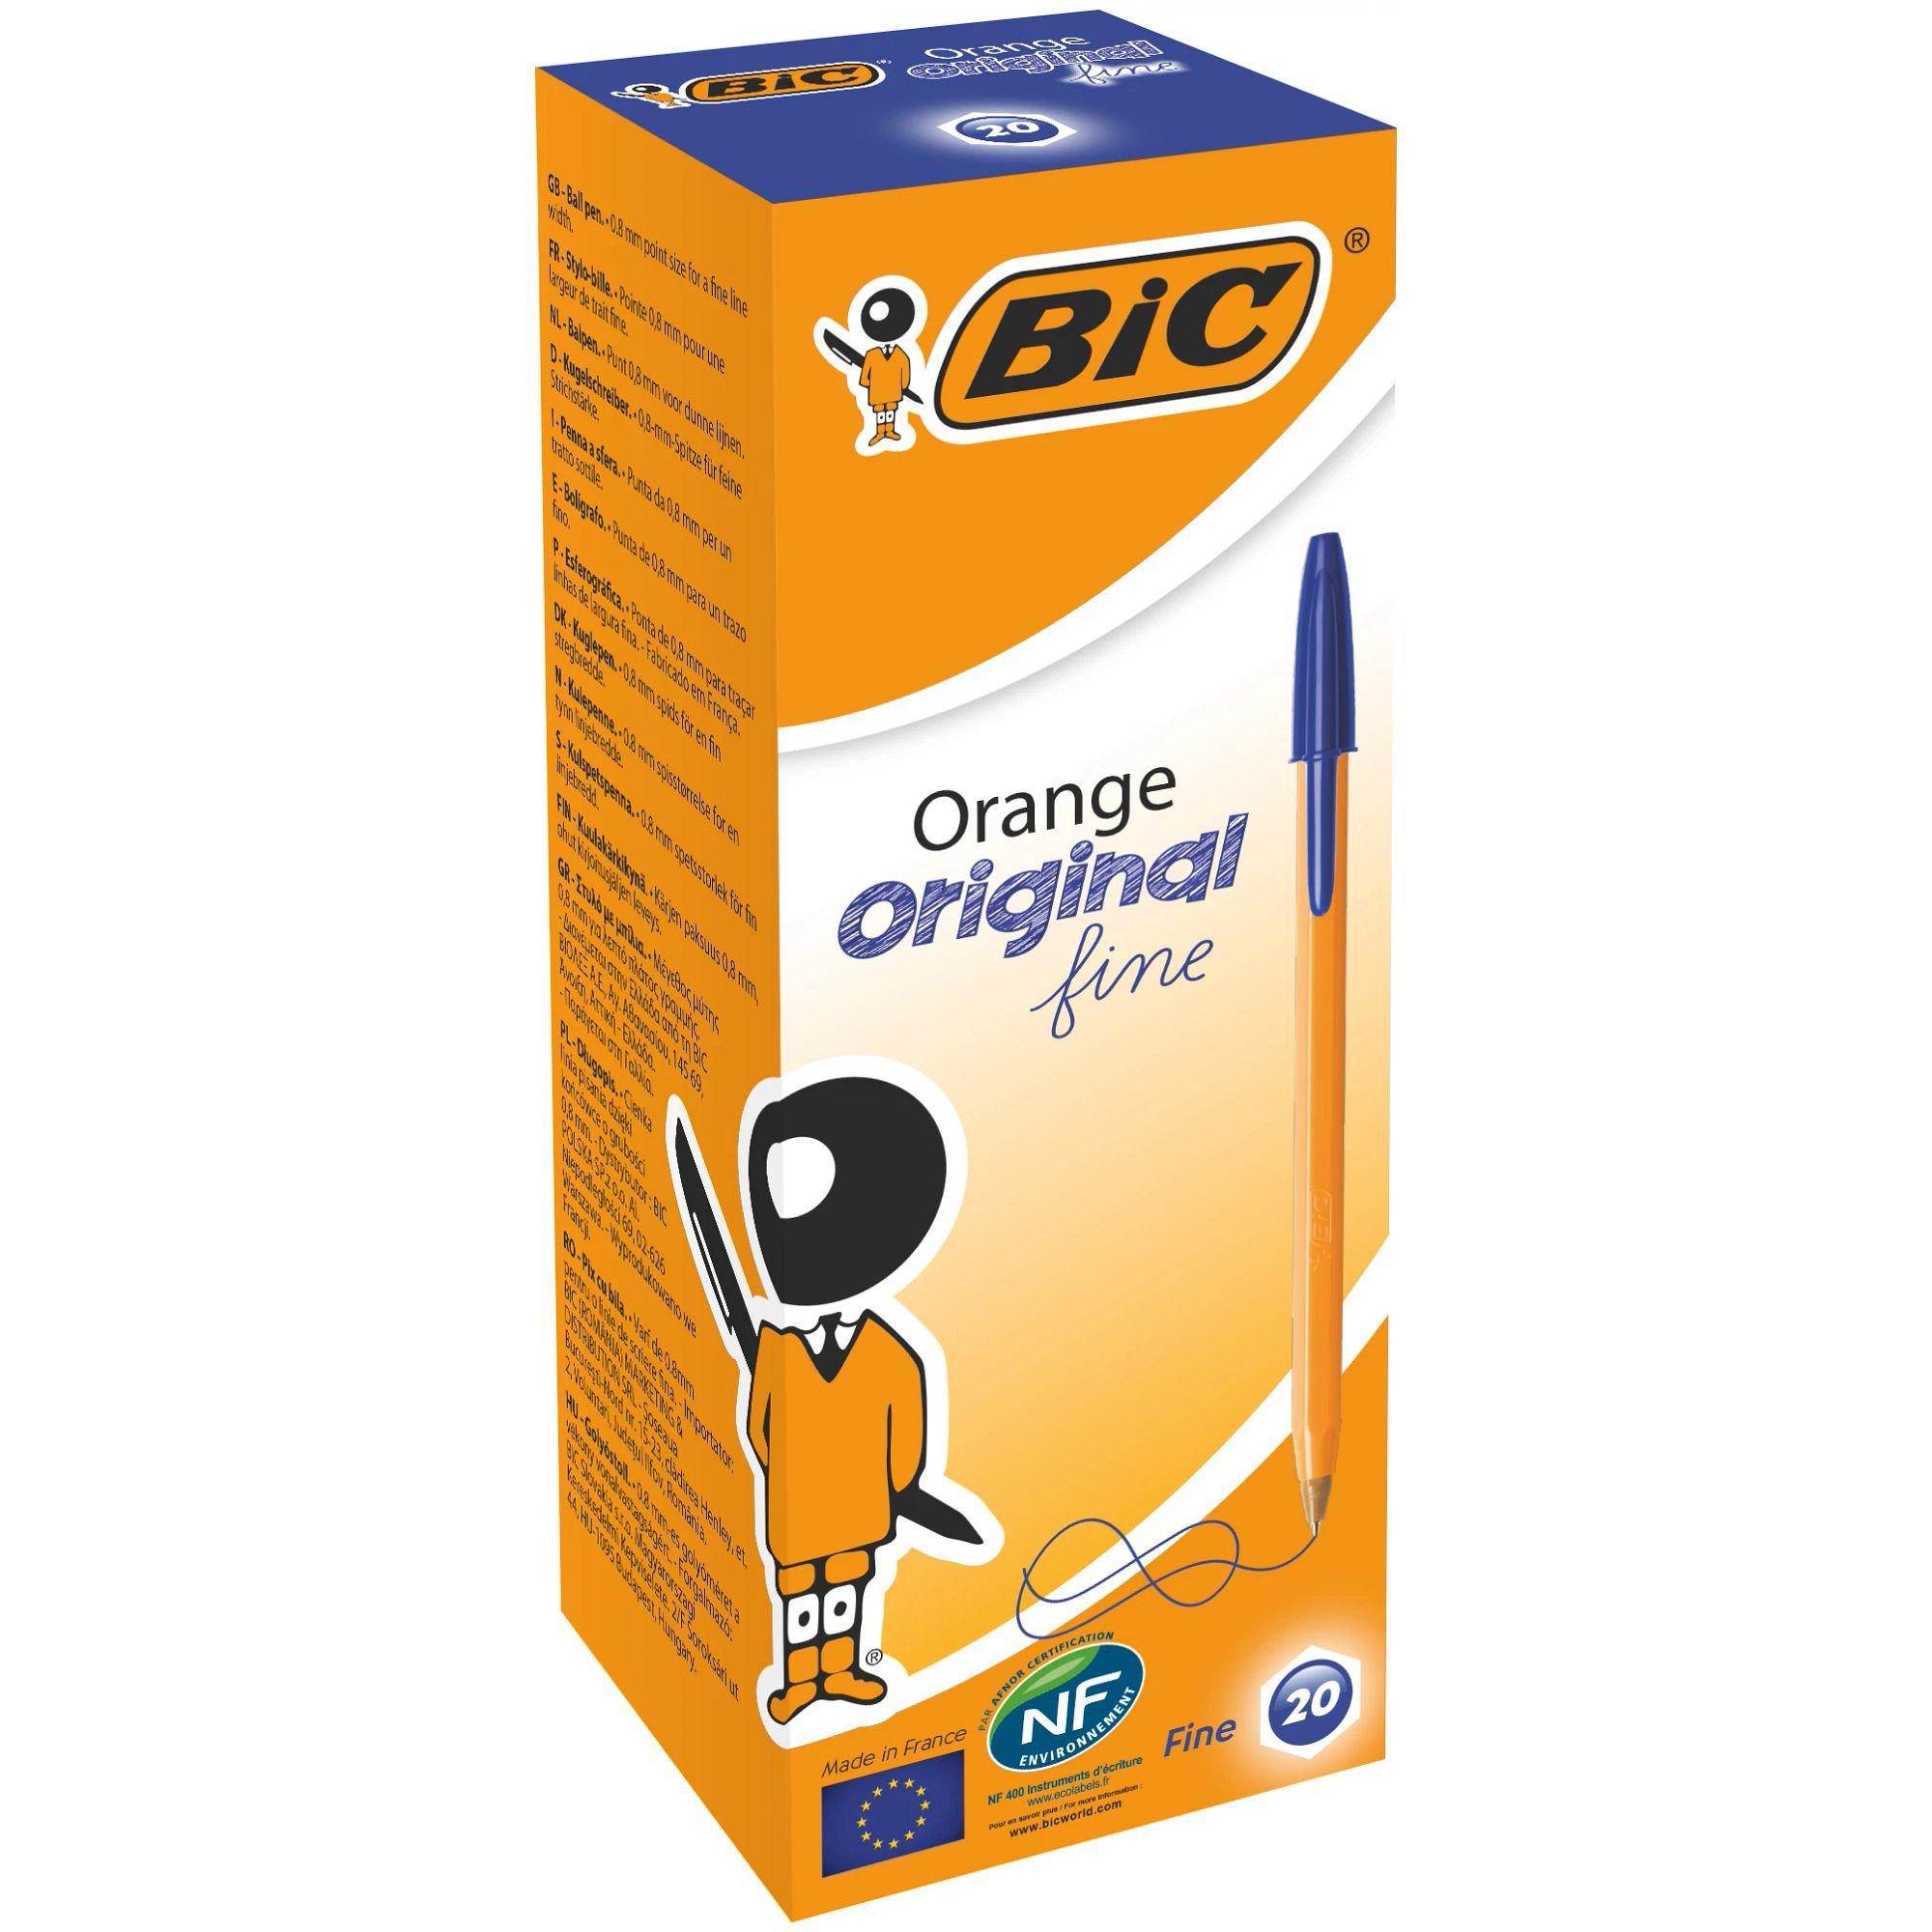 Image for BIC Orange Original Ballpoint Pen Fine Blue 101113